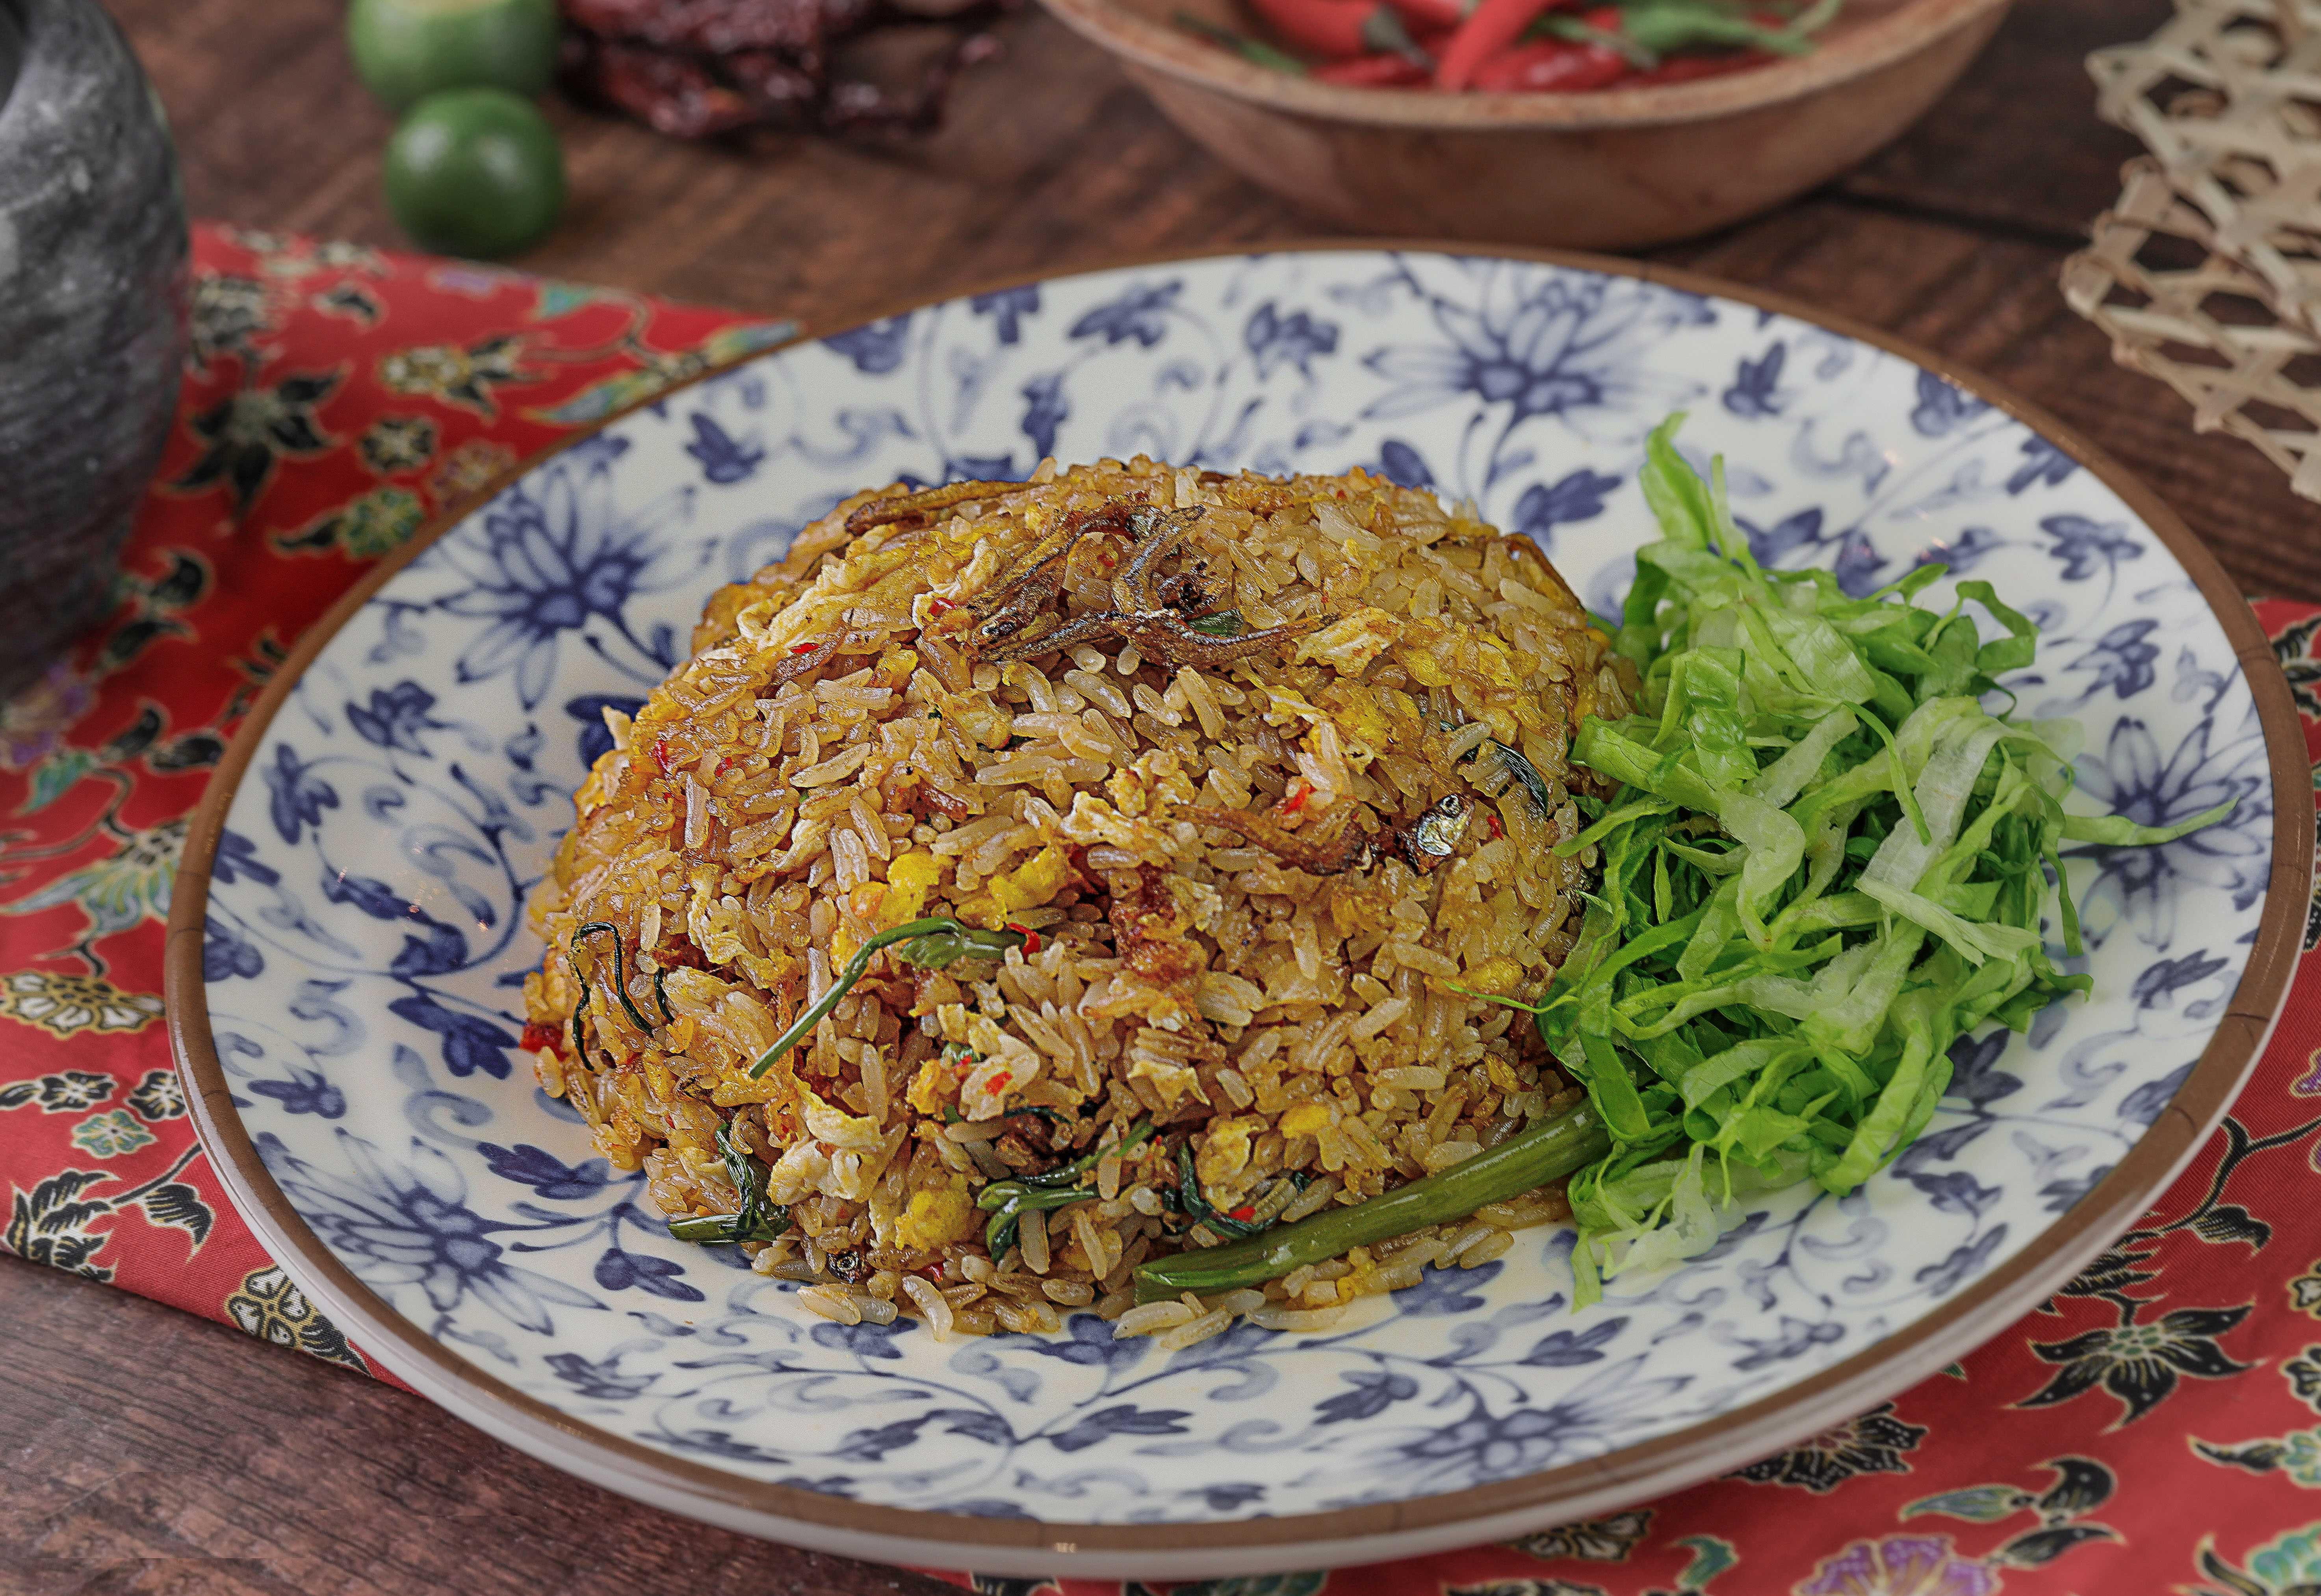 Chef Wan Penang Culture Mum's Fried Rice Nasi Goreng Emak